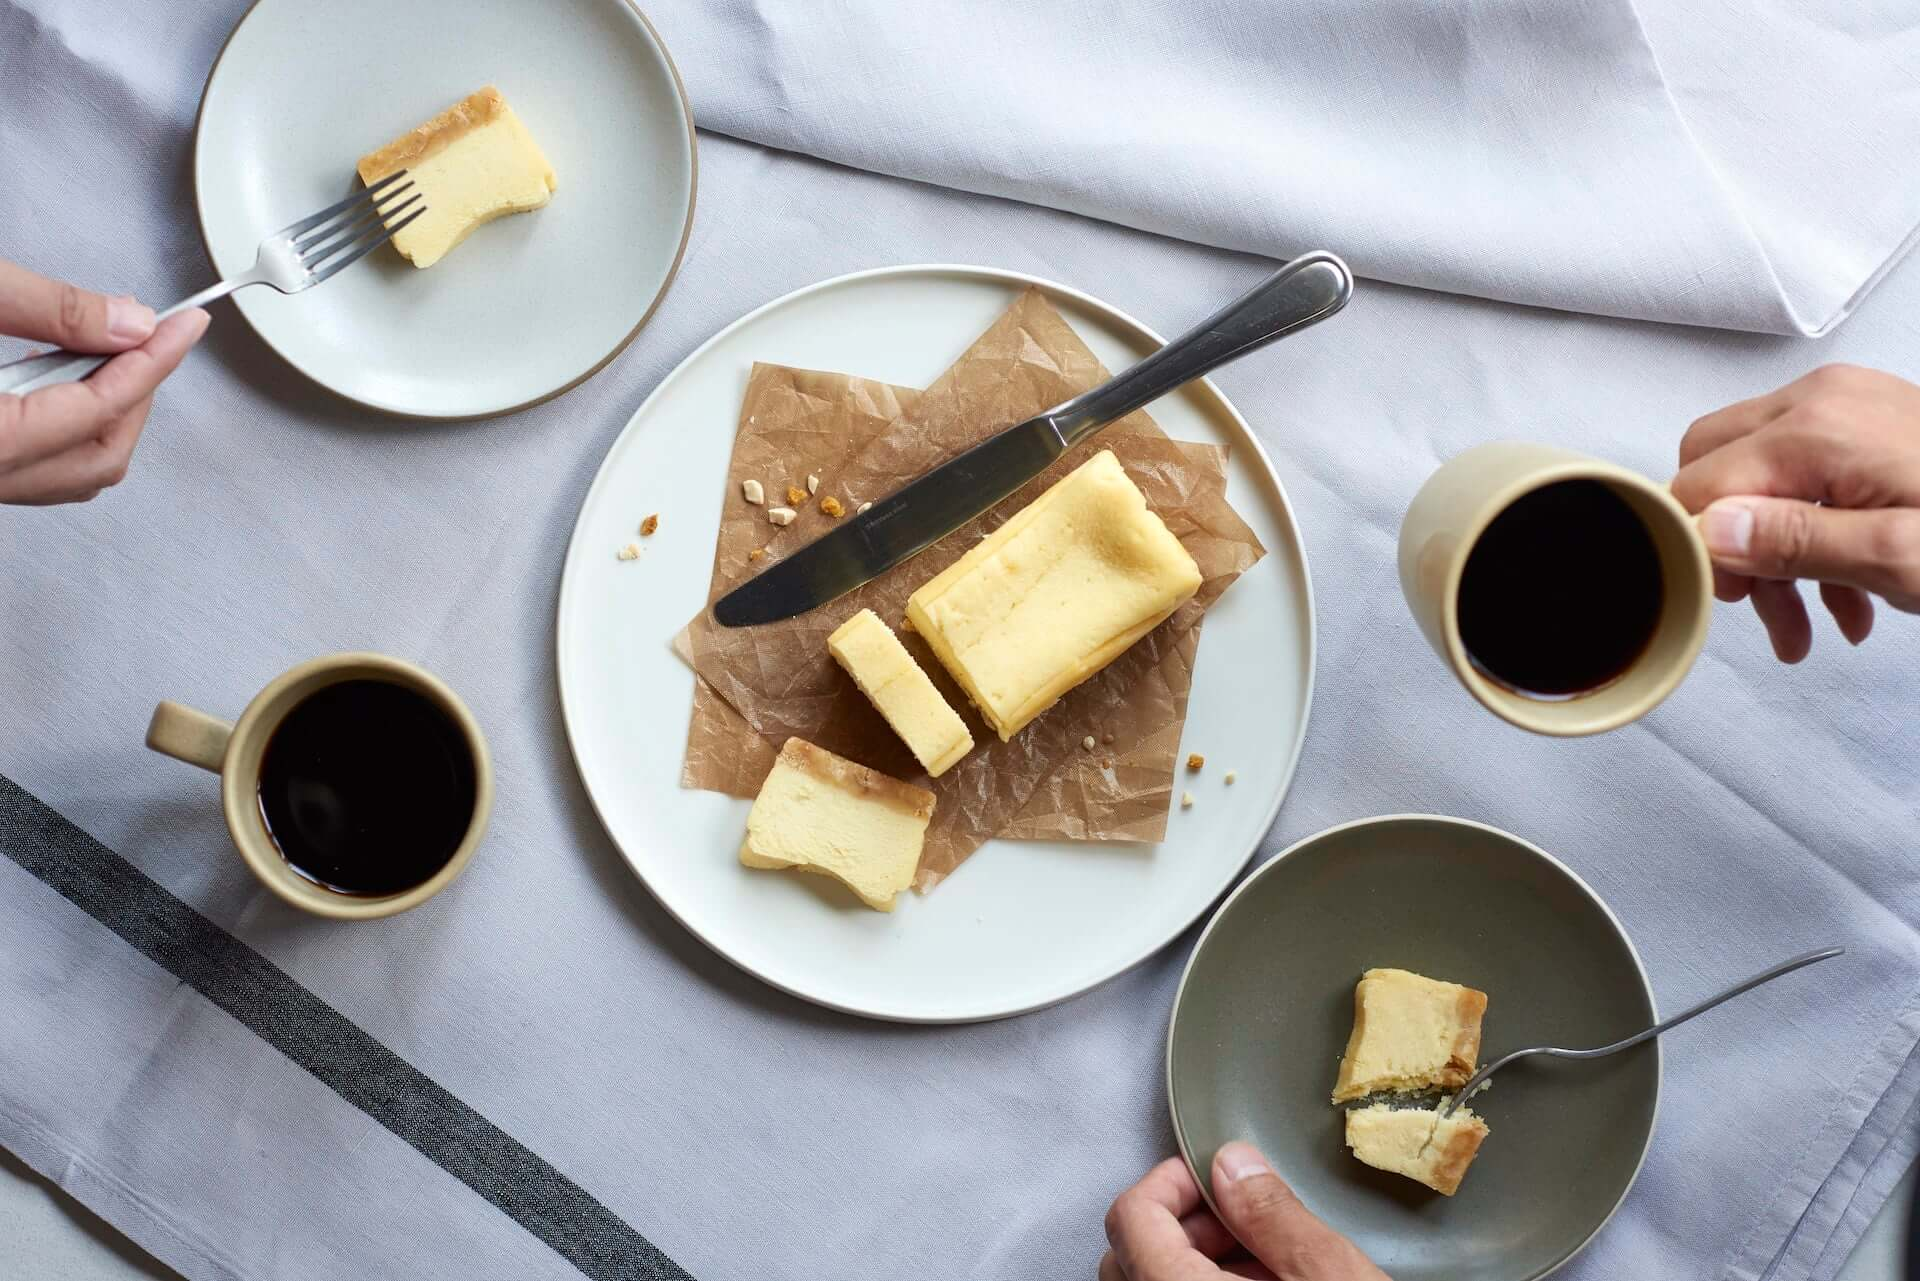 BAKEが濃厚なチーズテリーヌ主軸の新ブランド「THE CHEESE TERRINE by BAKE CHEESE TART」をローンチ!数量限定で予約受付開始 gourmet201201_bake-cheese-tart_1-1920x1281